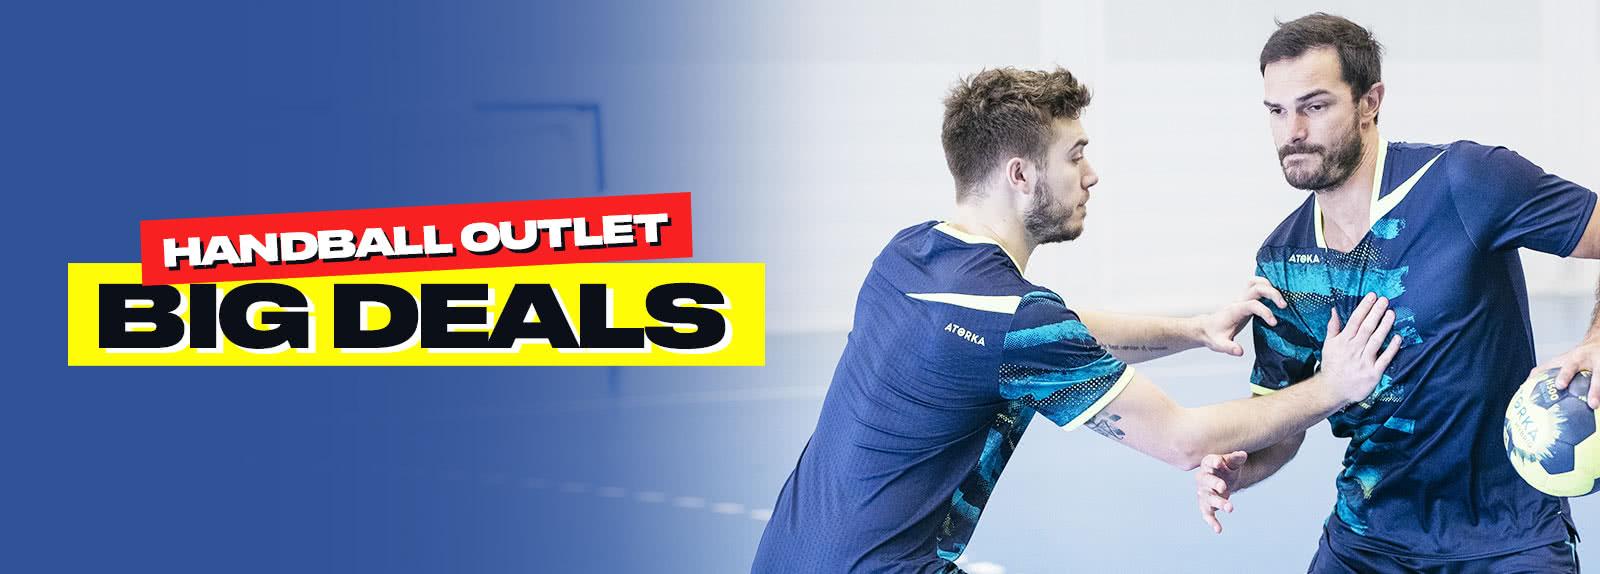 Handball Outlet